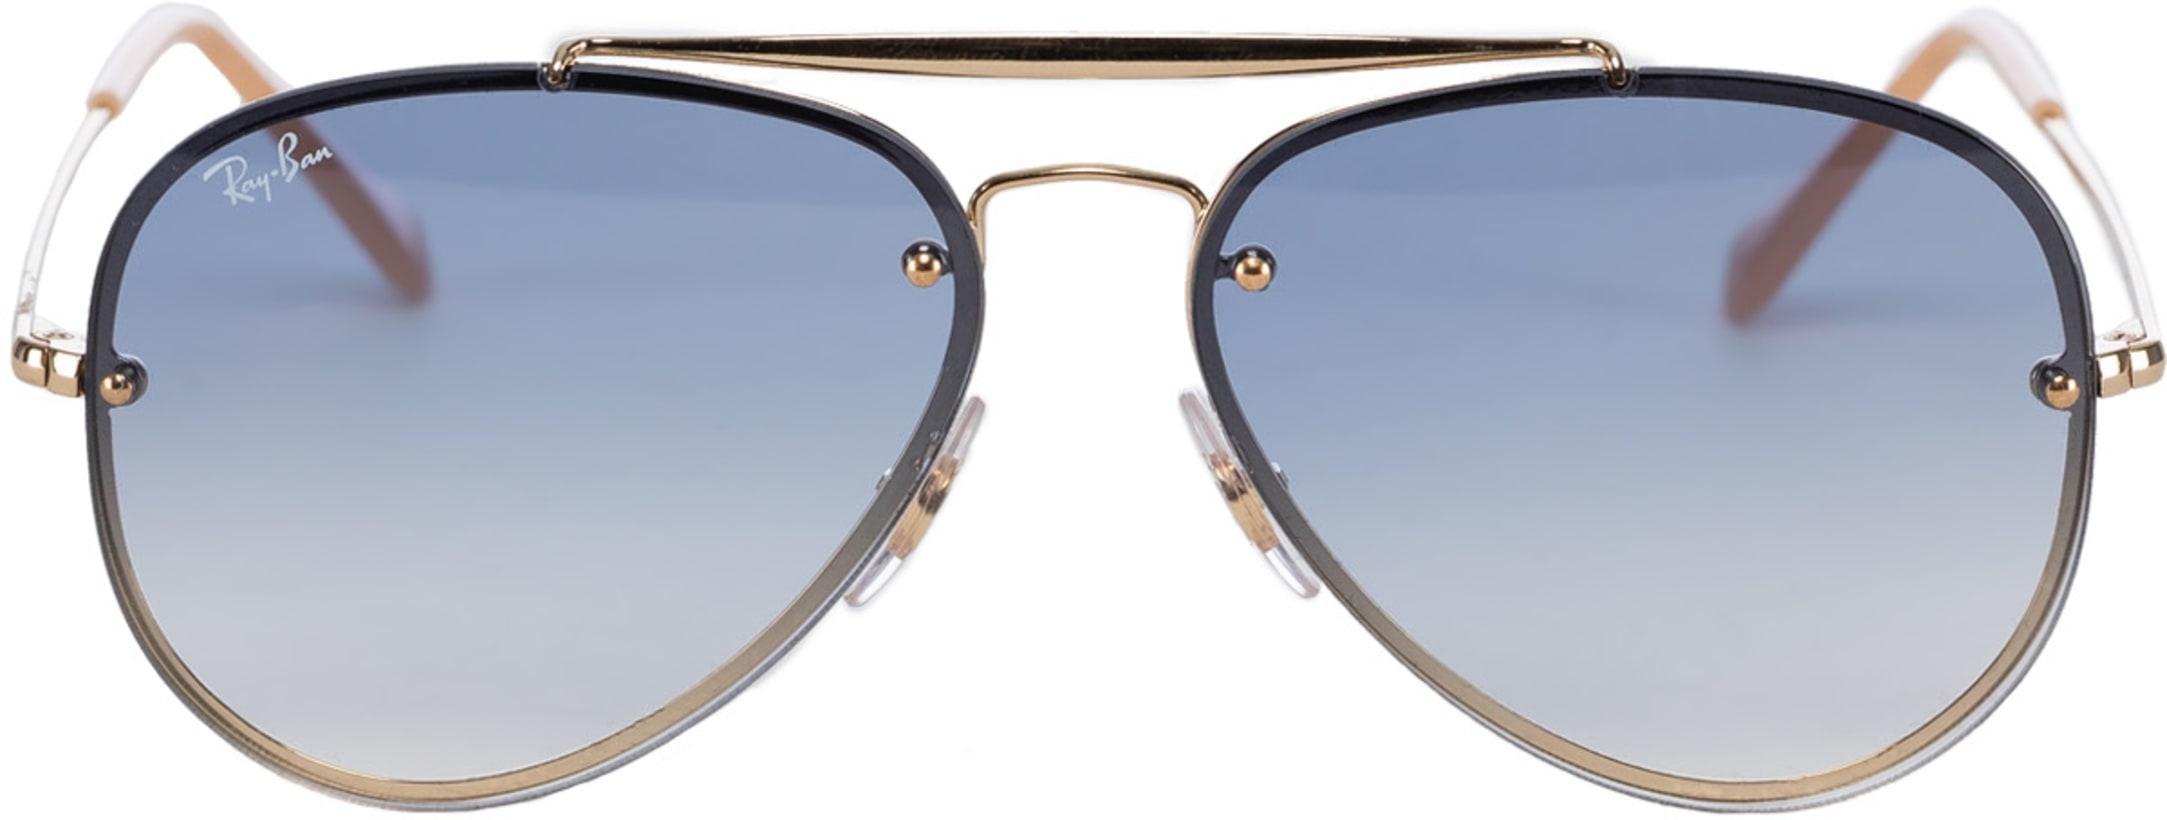 c7548adff9ea Ray-Ban: Blaze Aviator Sunglasses - Gold/Light Blue Gradient ...